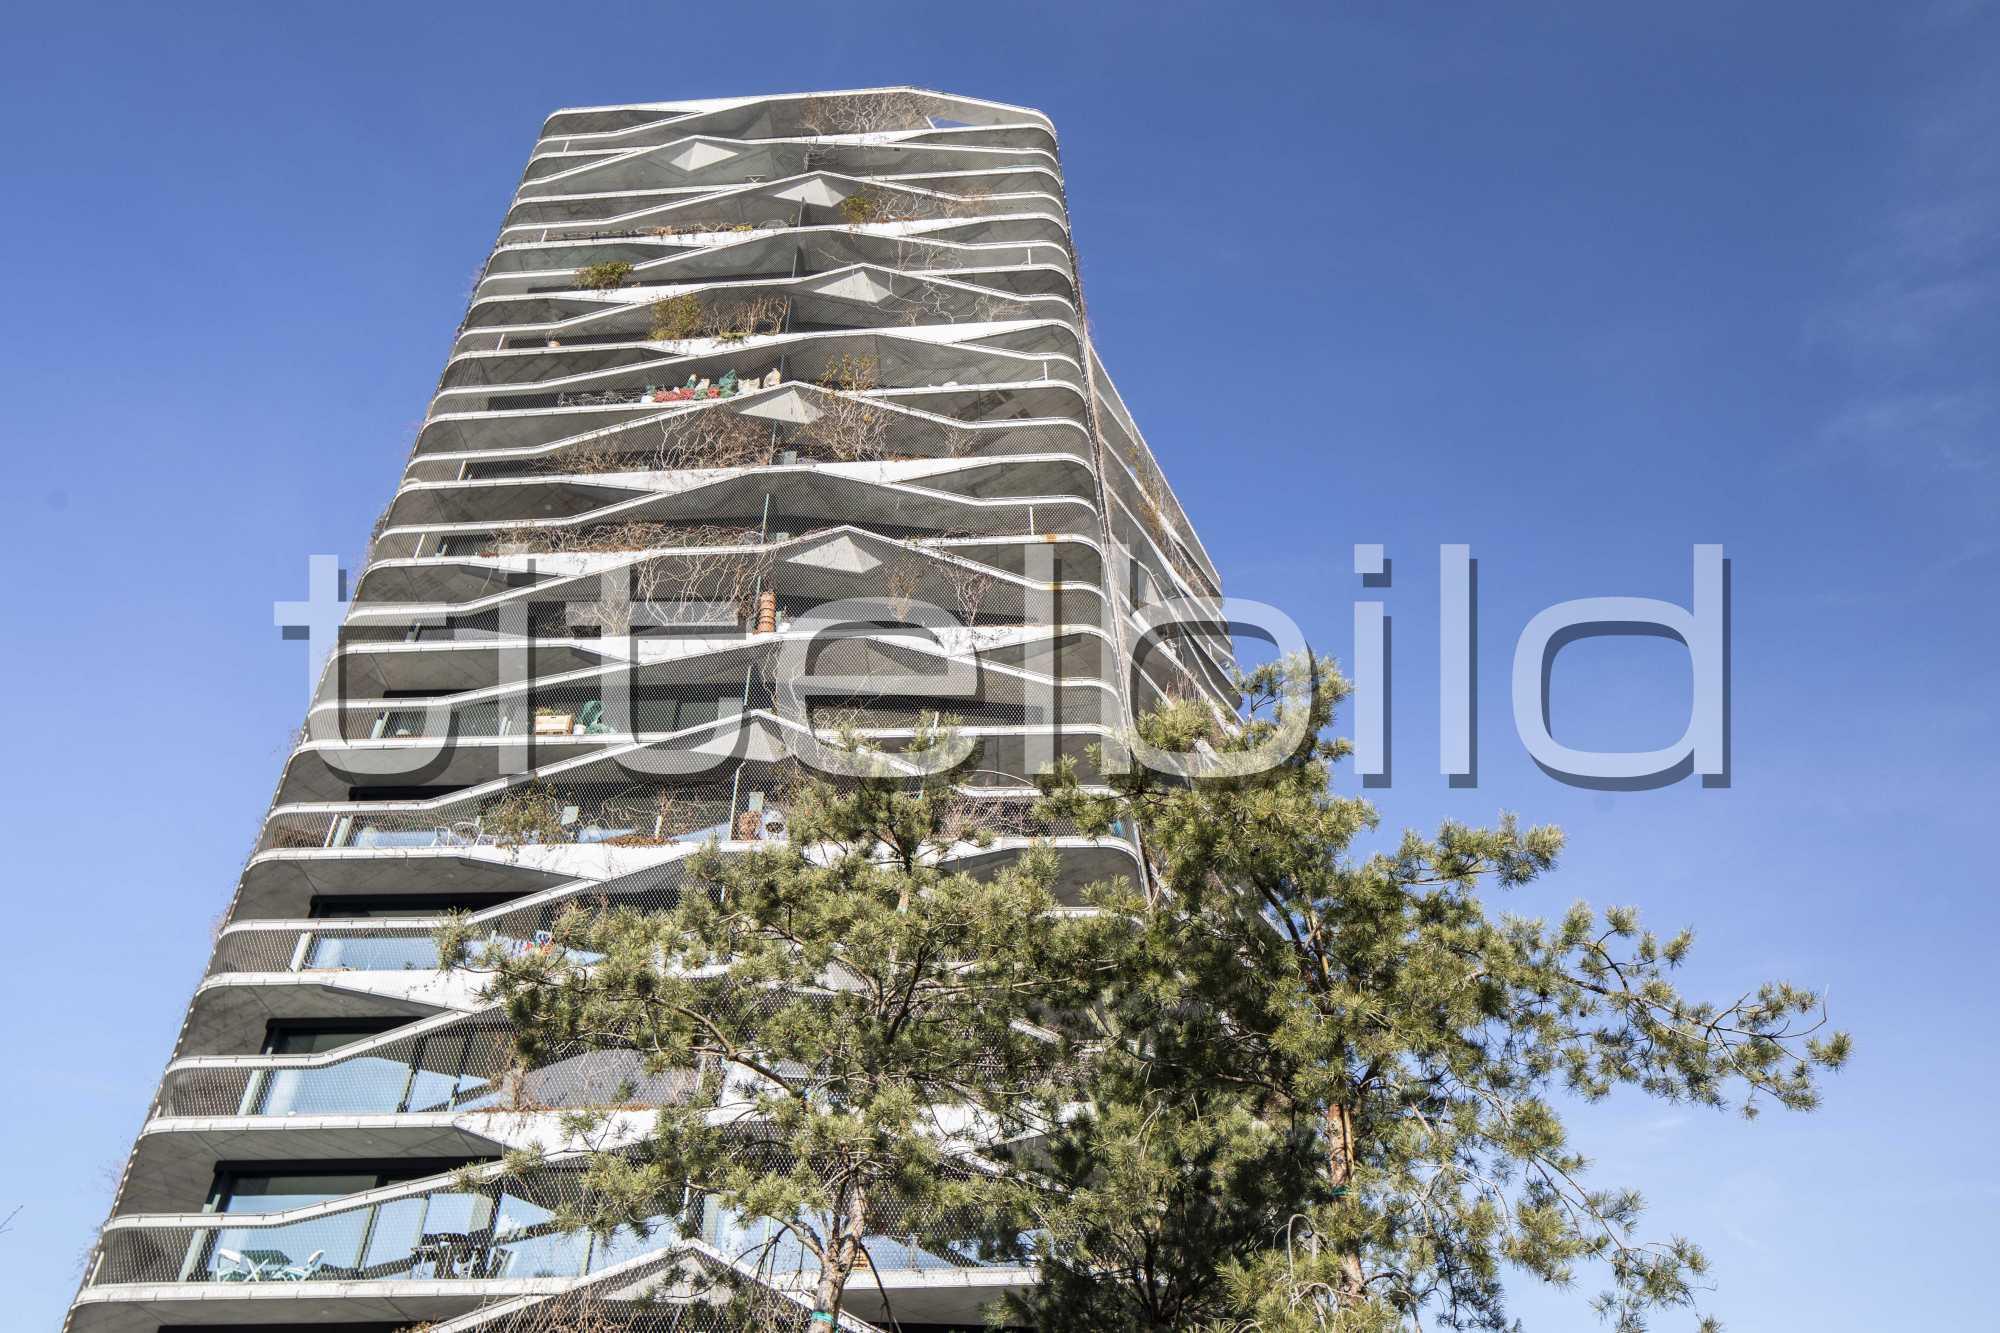 Projektbild-Nr. 2: Garden Tower Bächtelenpark Wabern